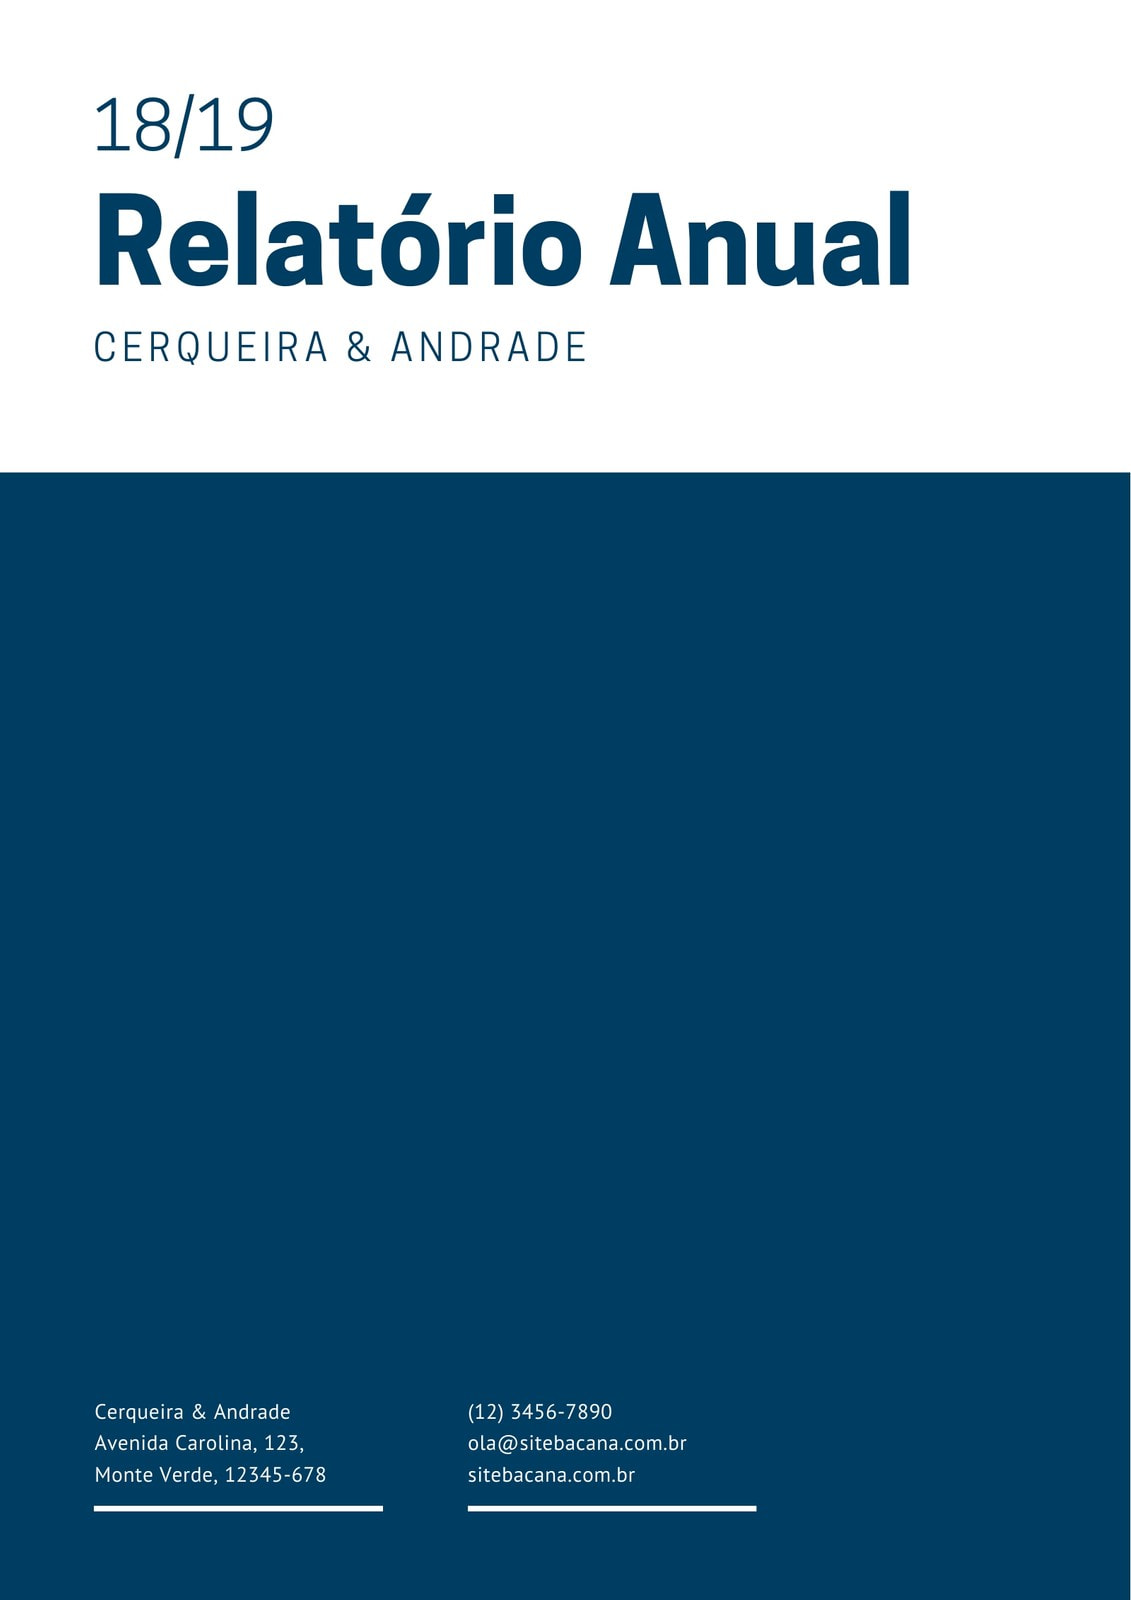 Azul Escuro Minimalista Formal Anual Relatório